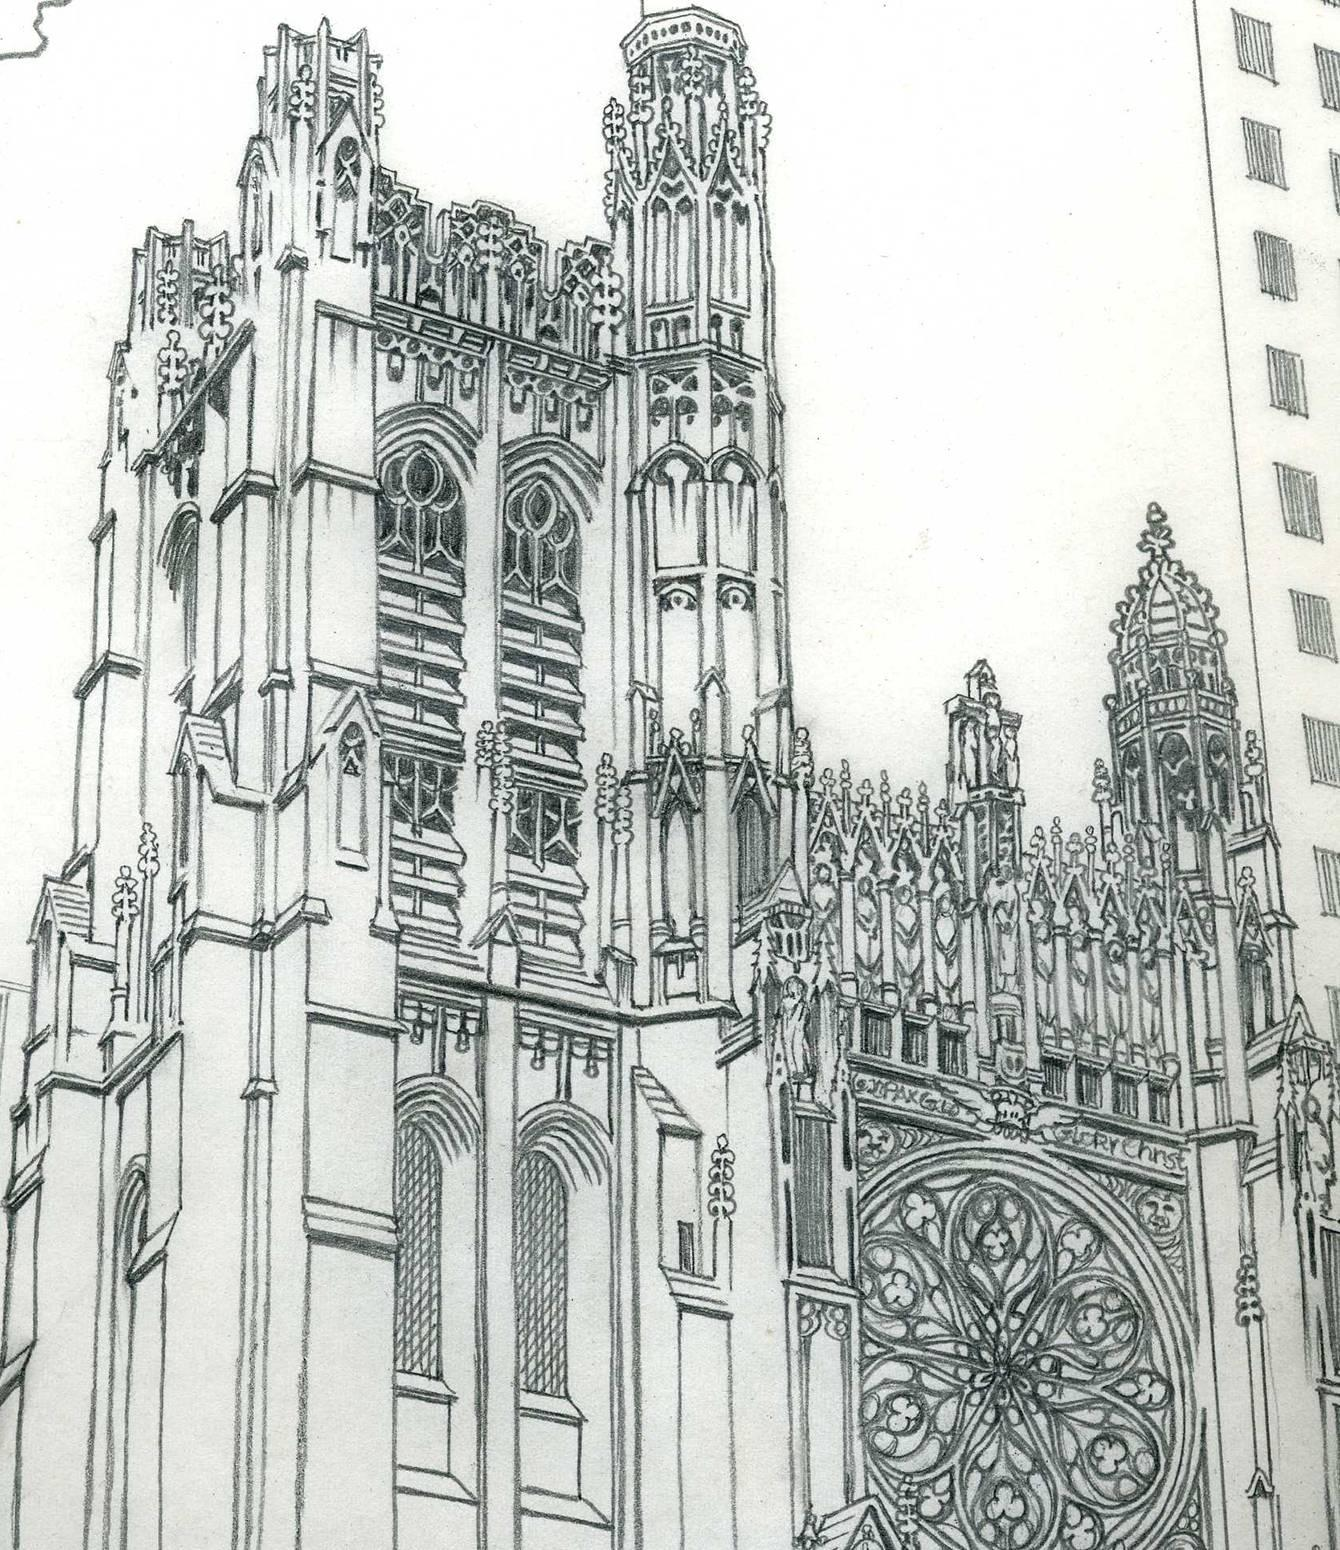 St Thomas Church 5th at 53rd, Original drawing from 1975 Manhattan Coloring Book